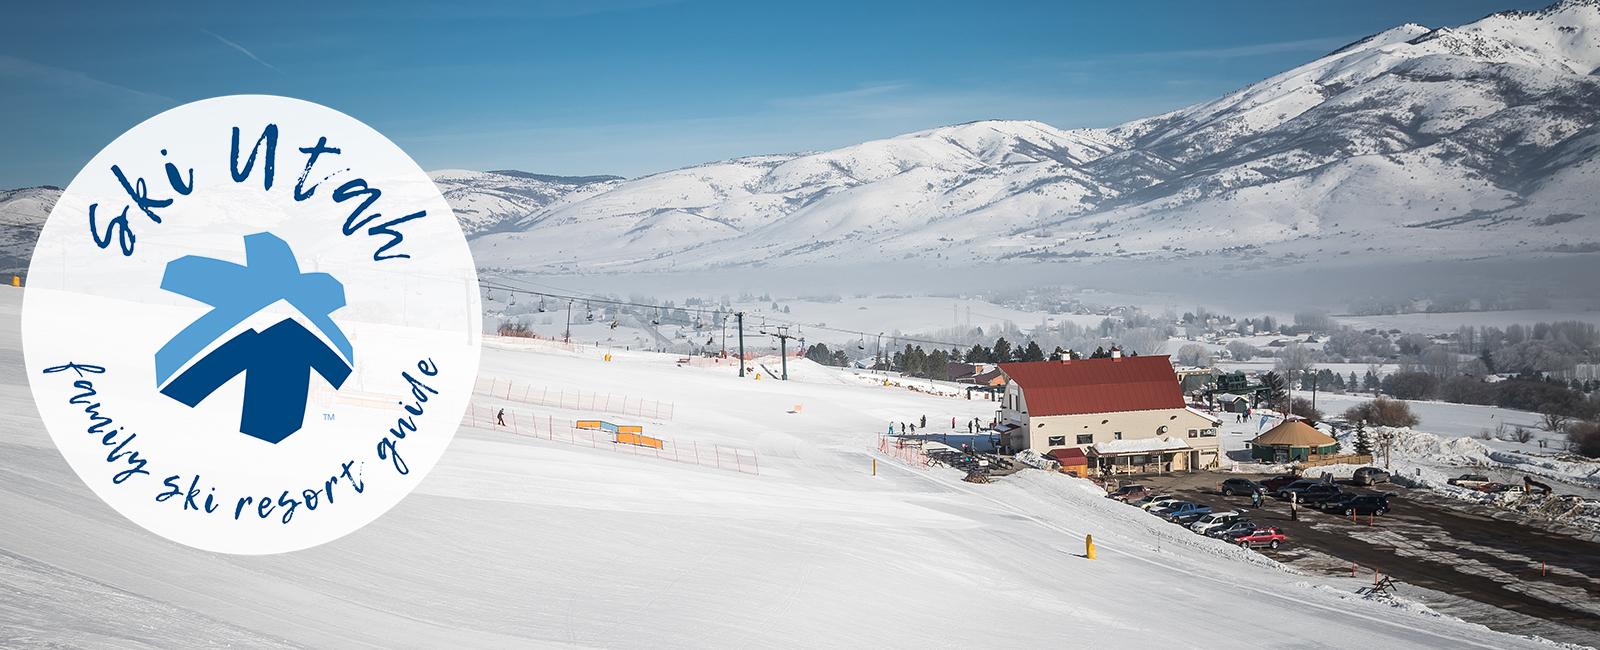 Family Ski Resort Guide | Nordic Valley